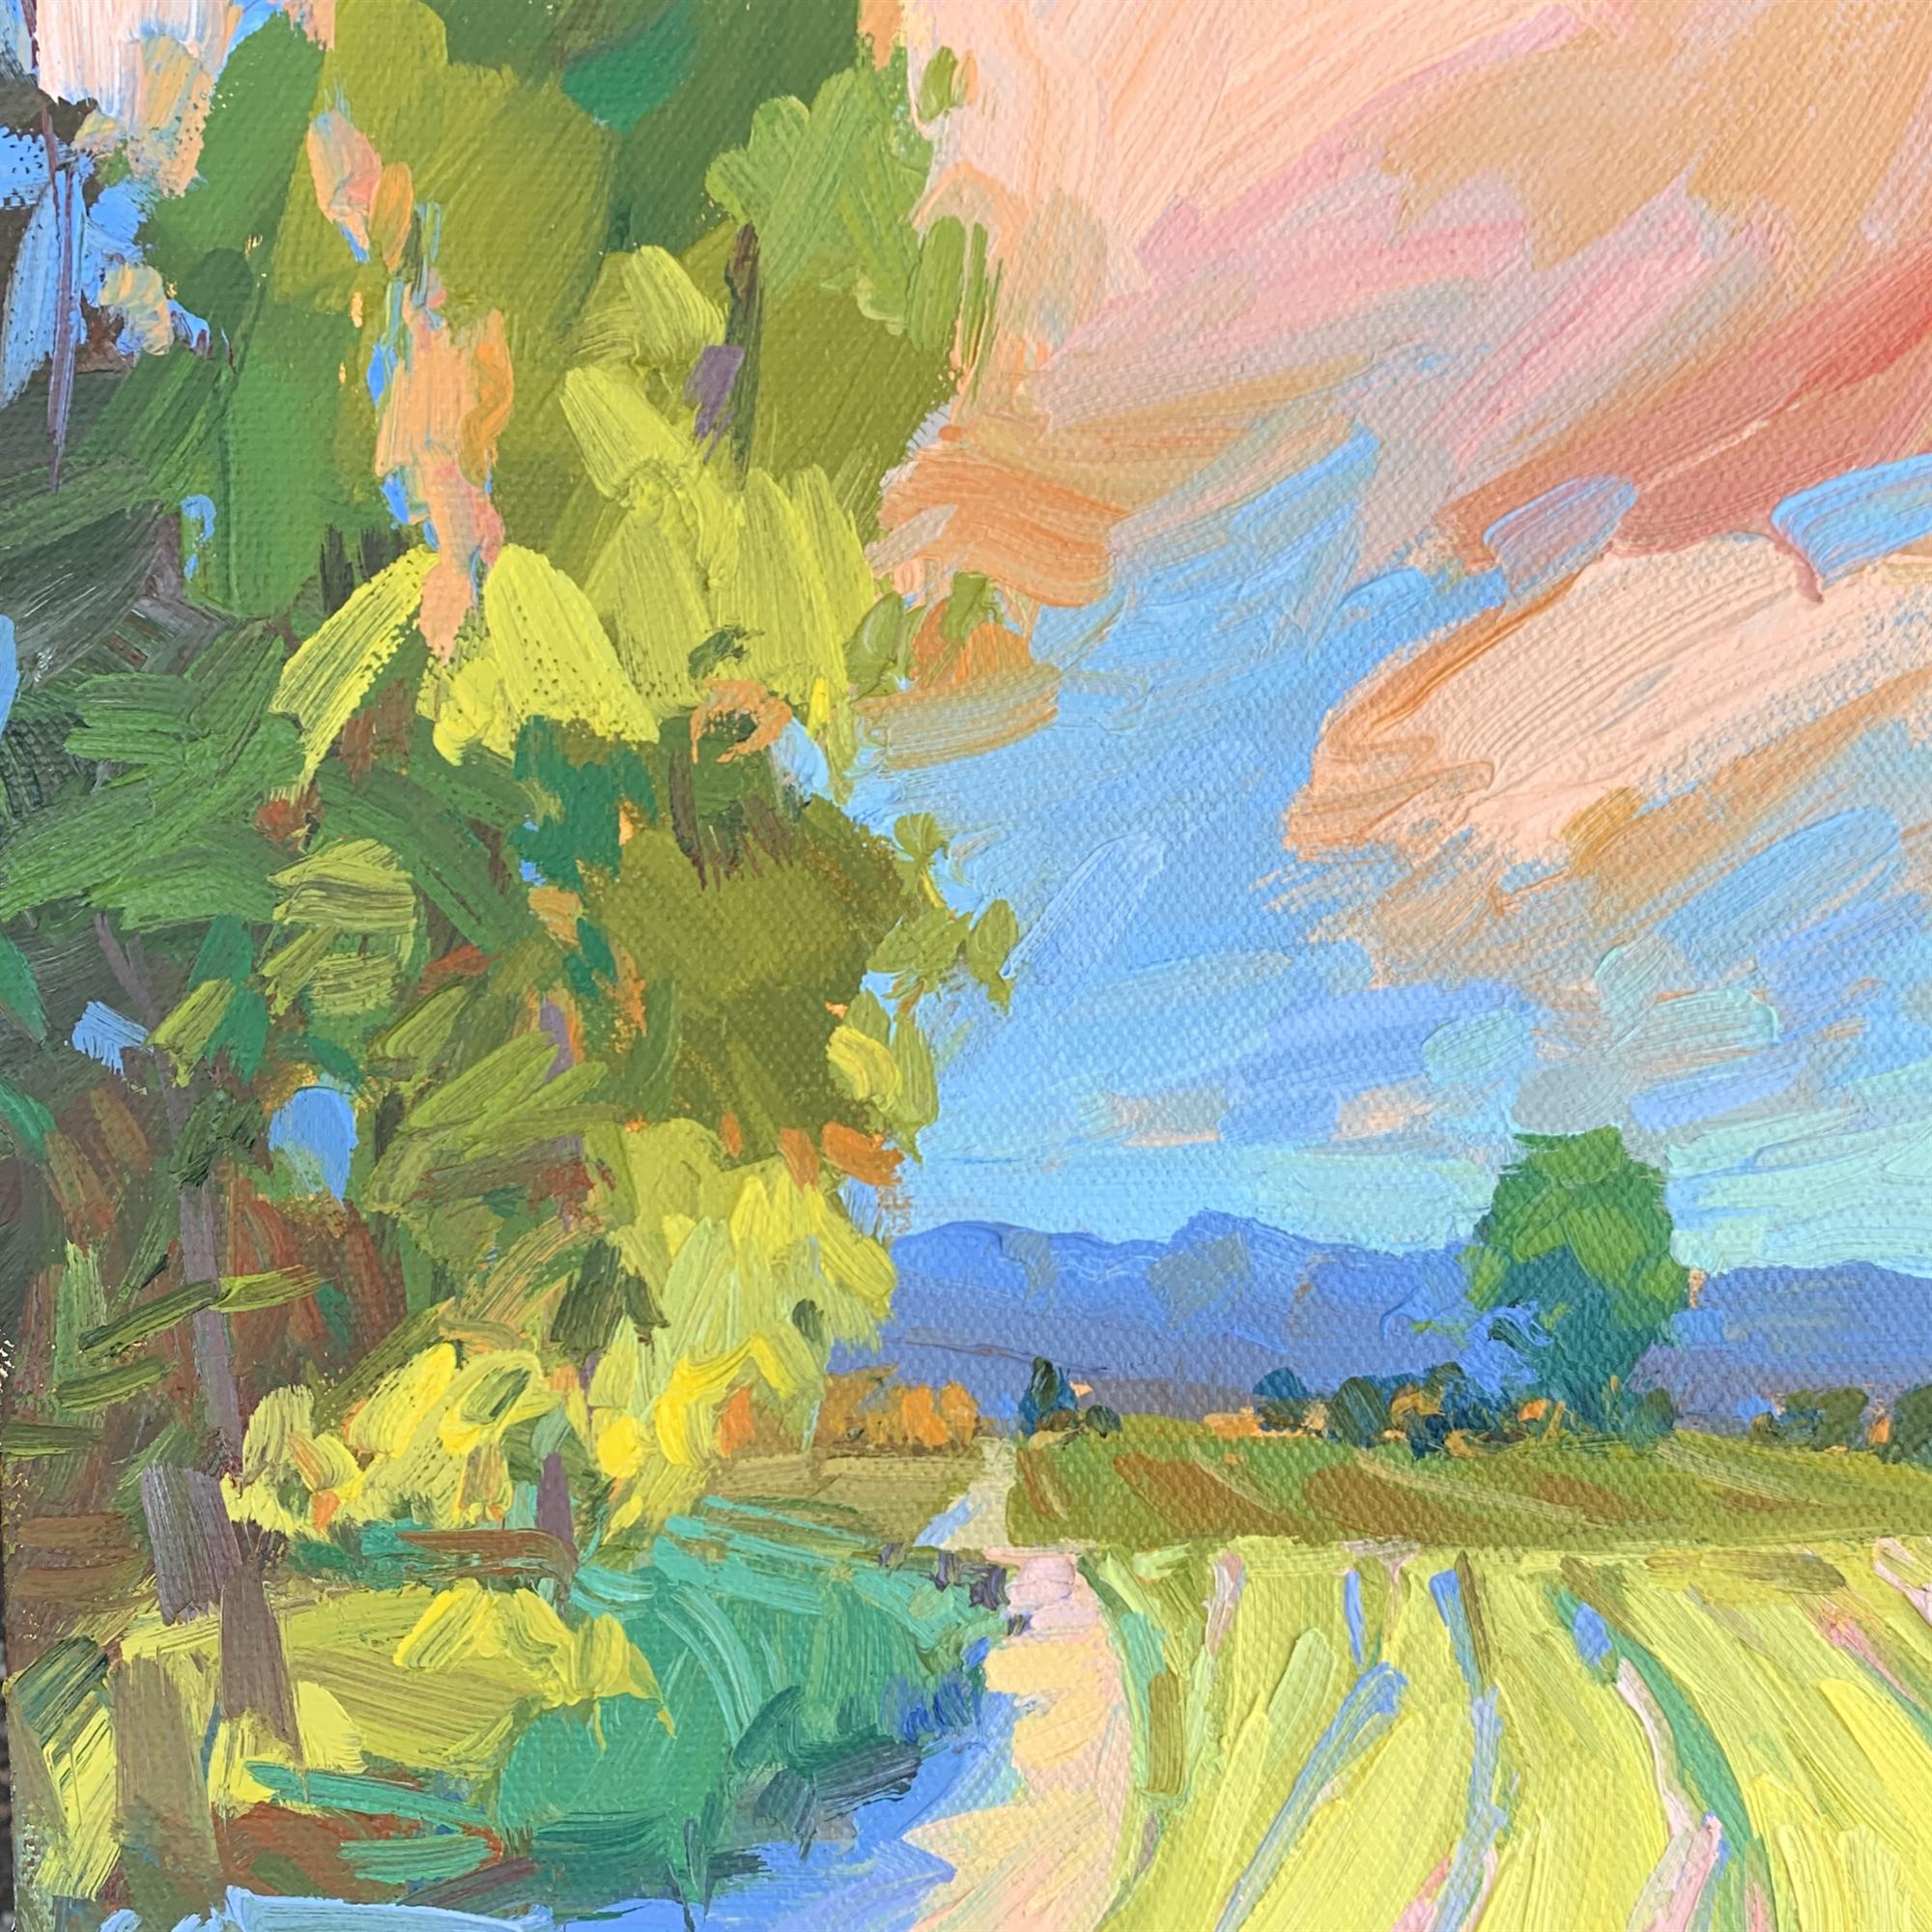 Farmer's Field by Marissa Vogl